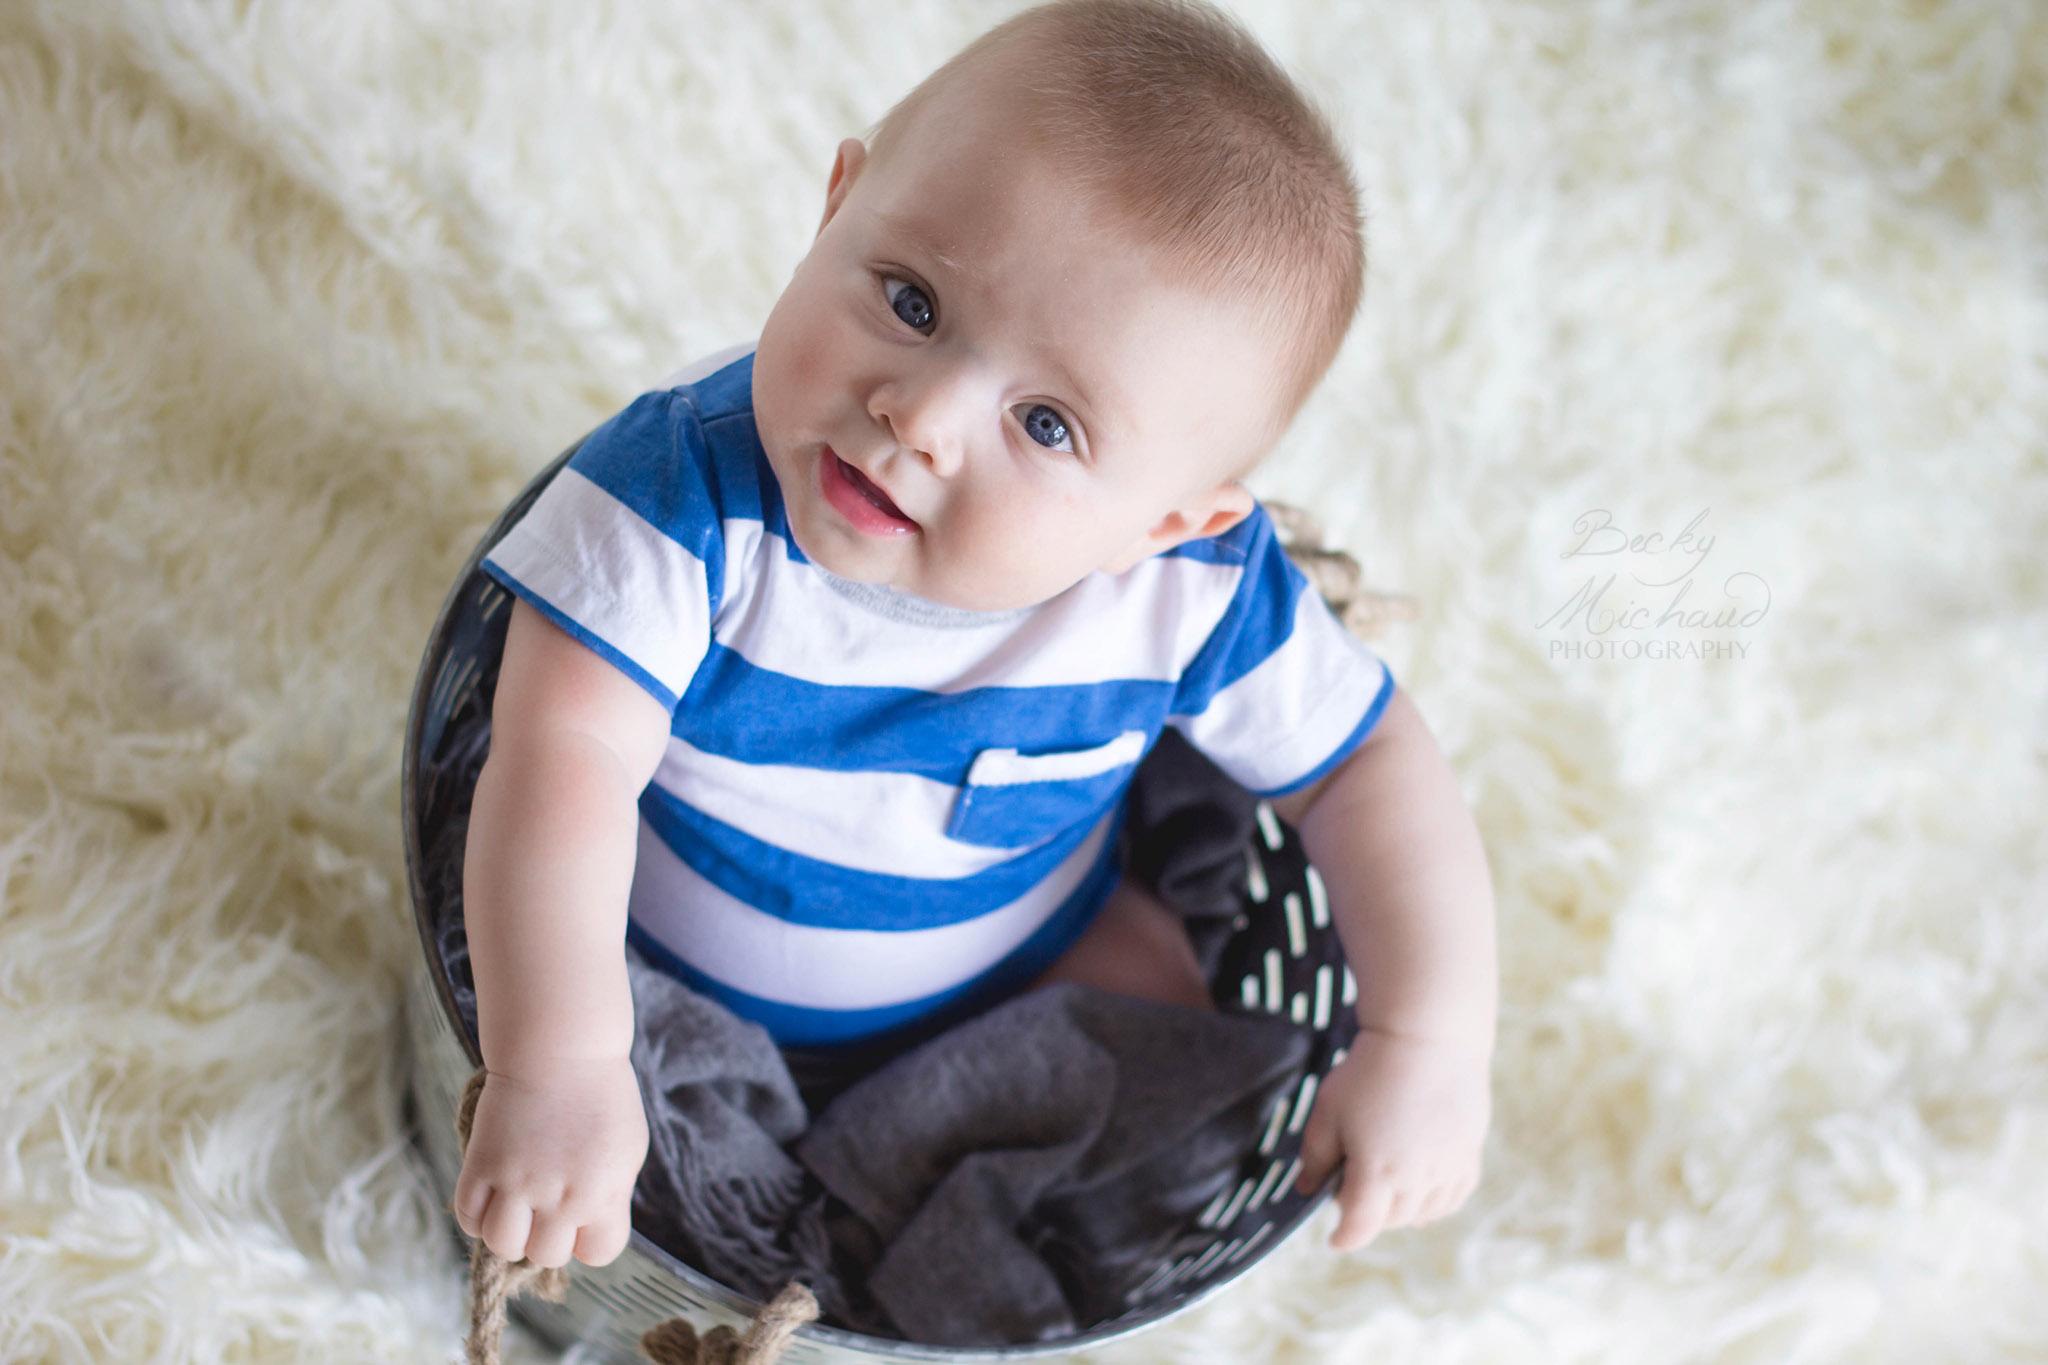 Baby boy wearing a striped blue shirt sitting in a bucket